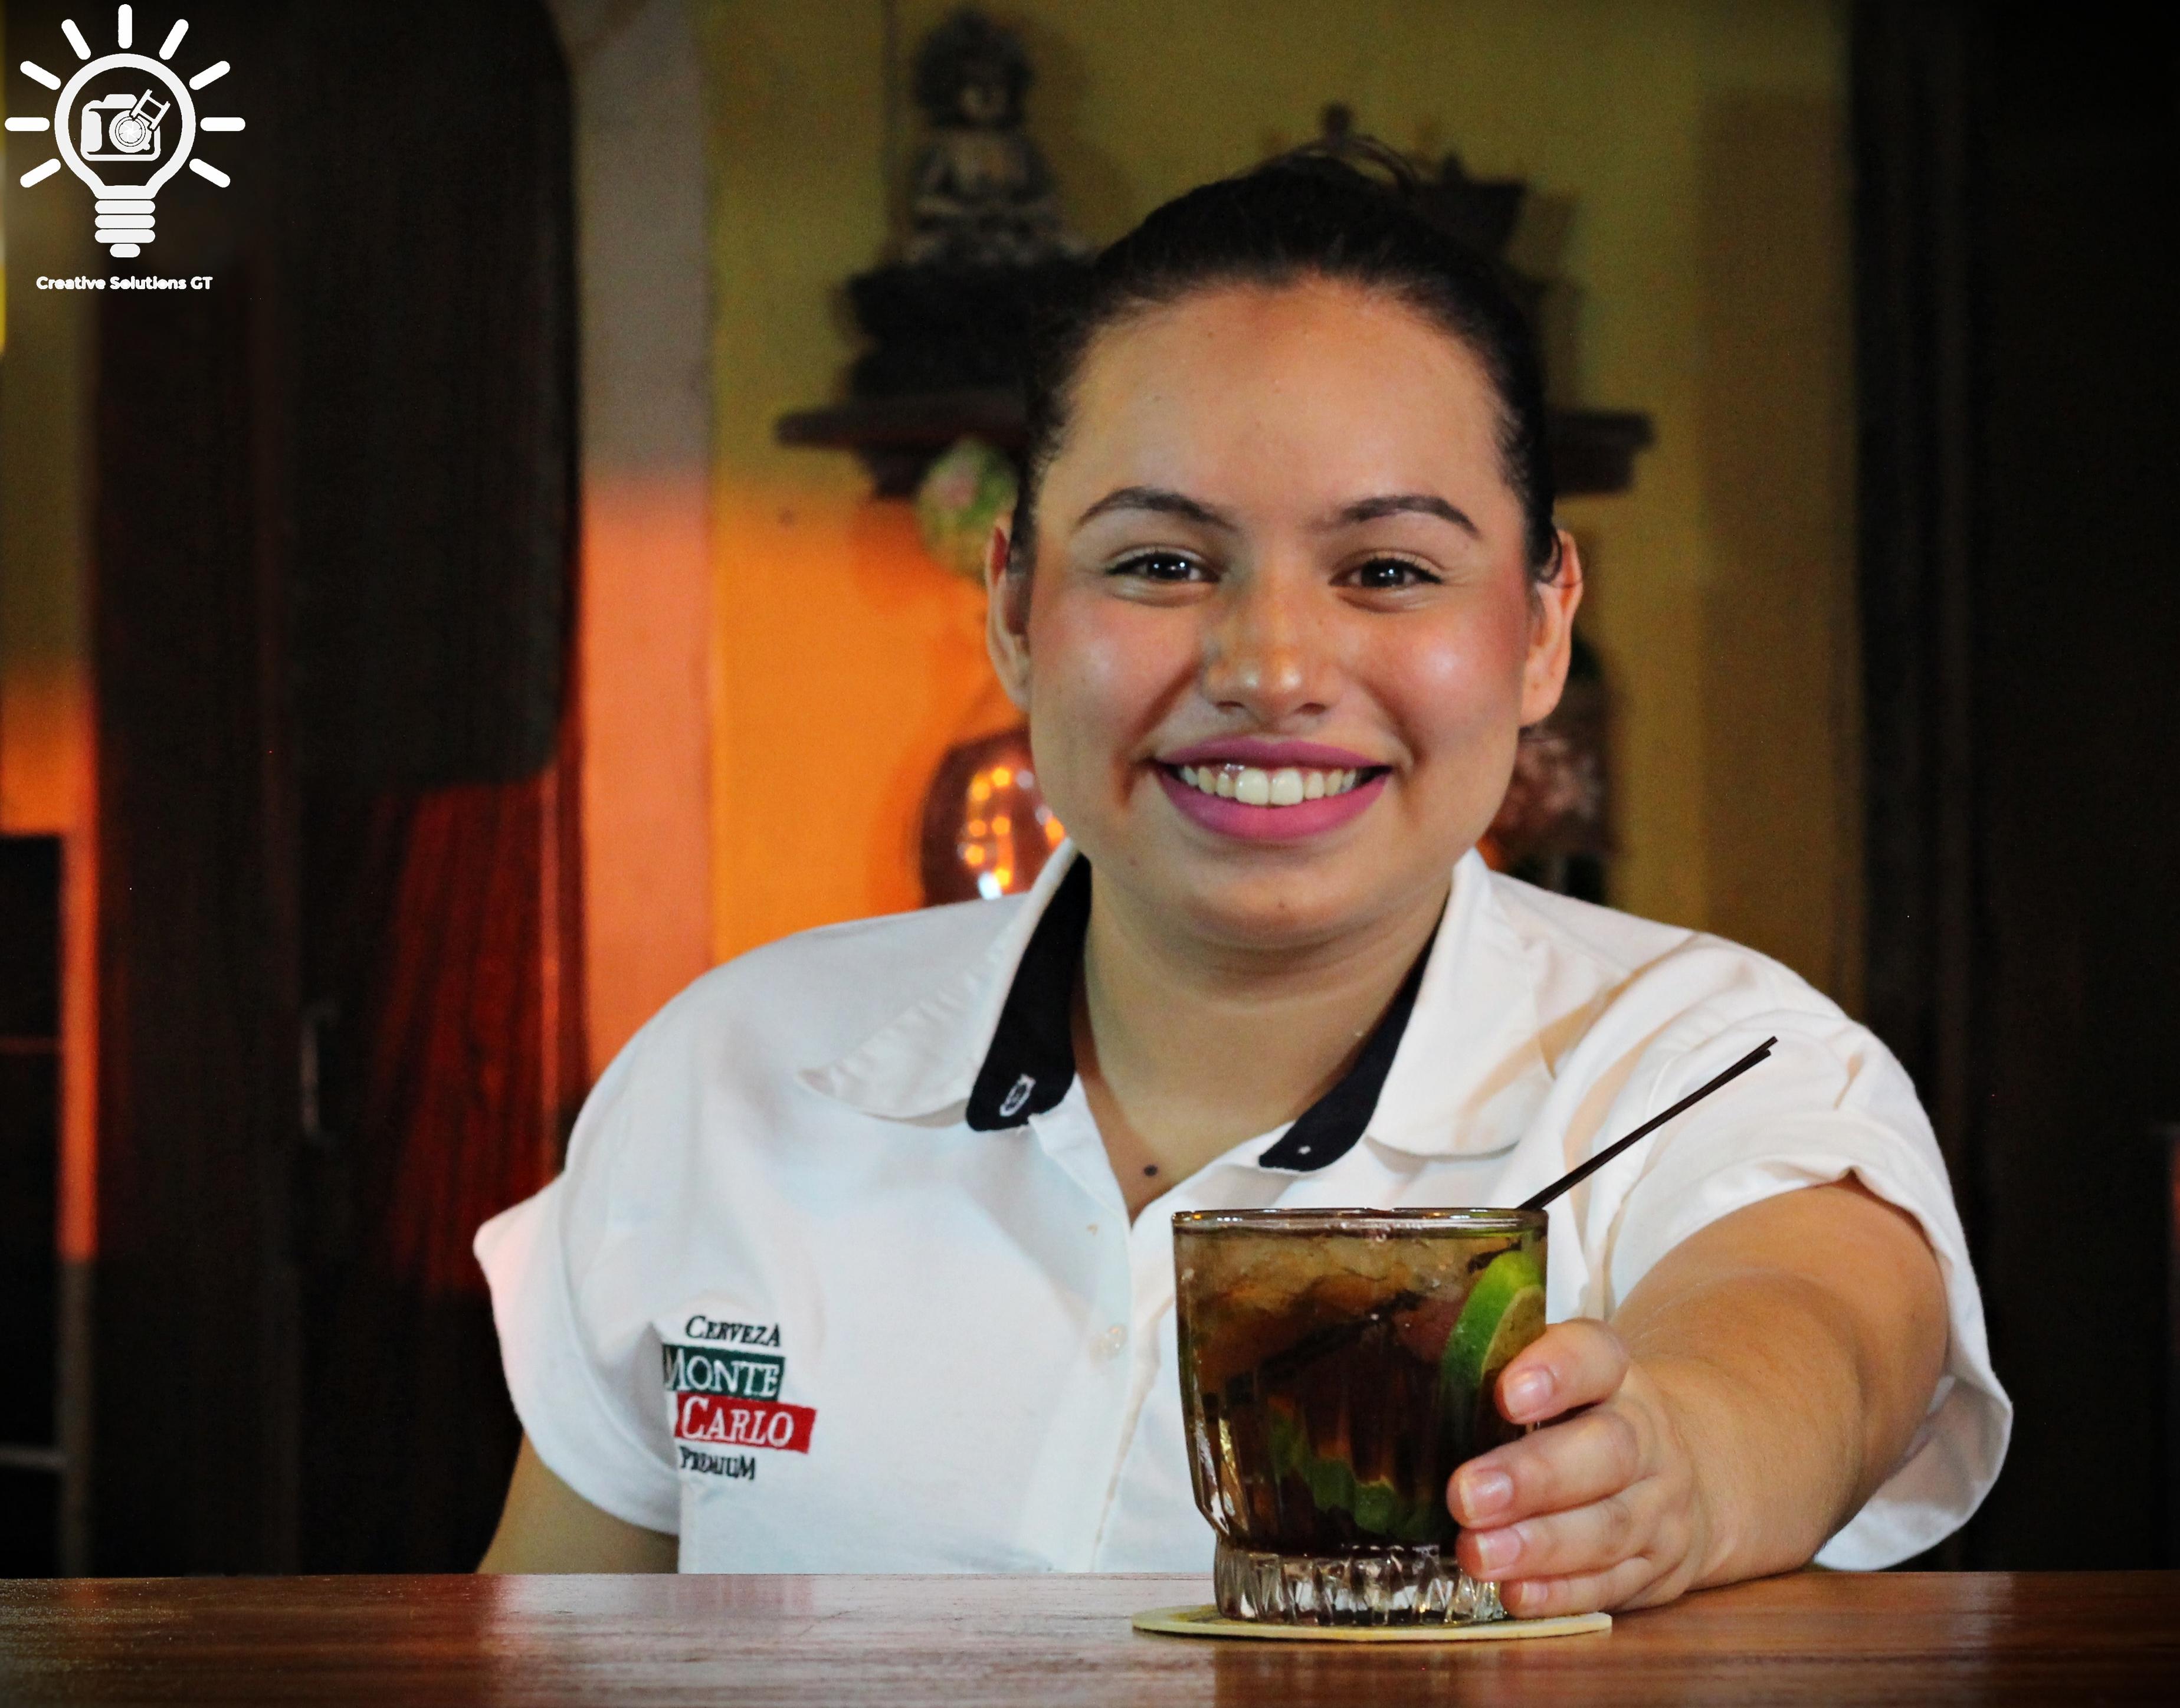 fotografia para productos en guatemala (5)